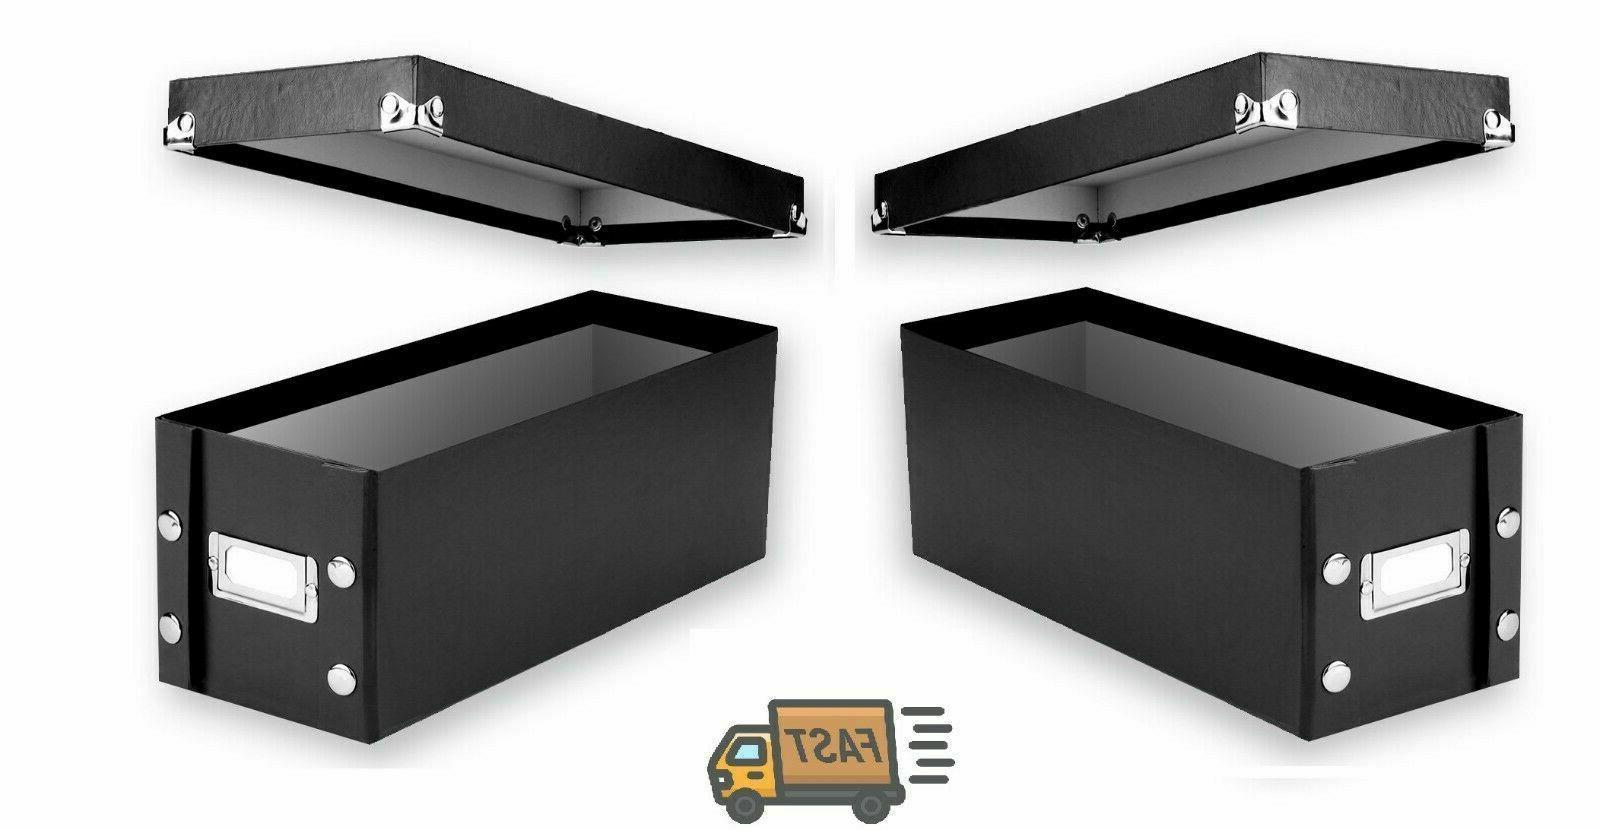 2 CD Storage Rack Box Holder Disk Case Media Display Space S